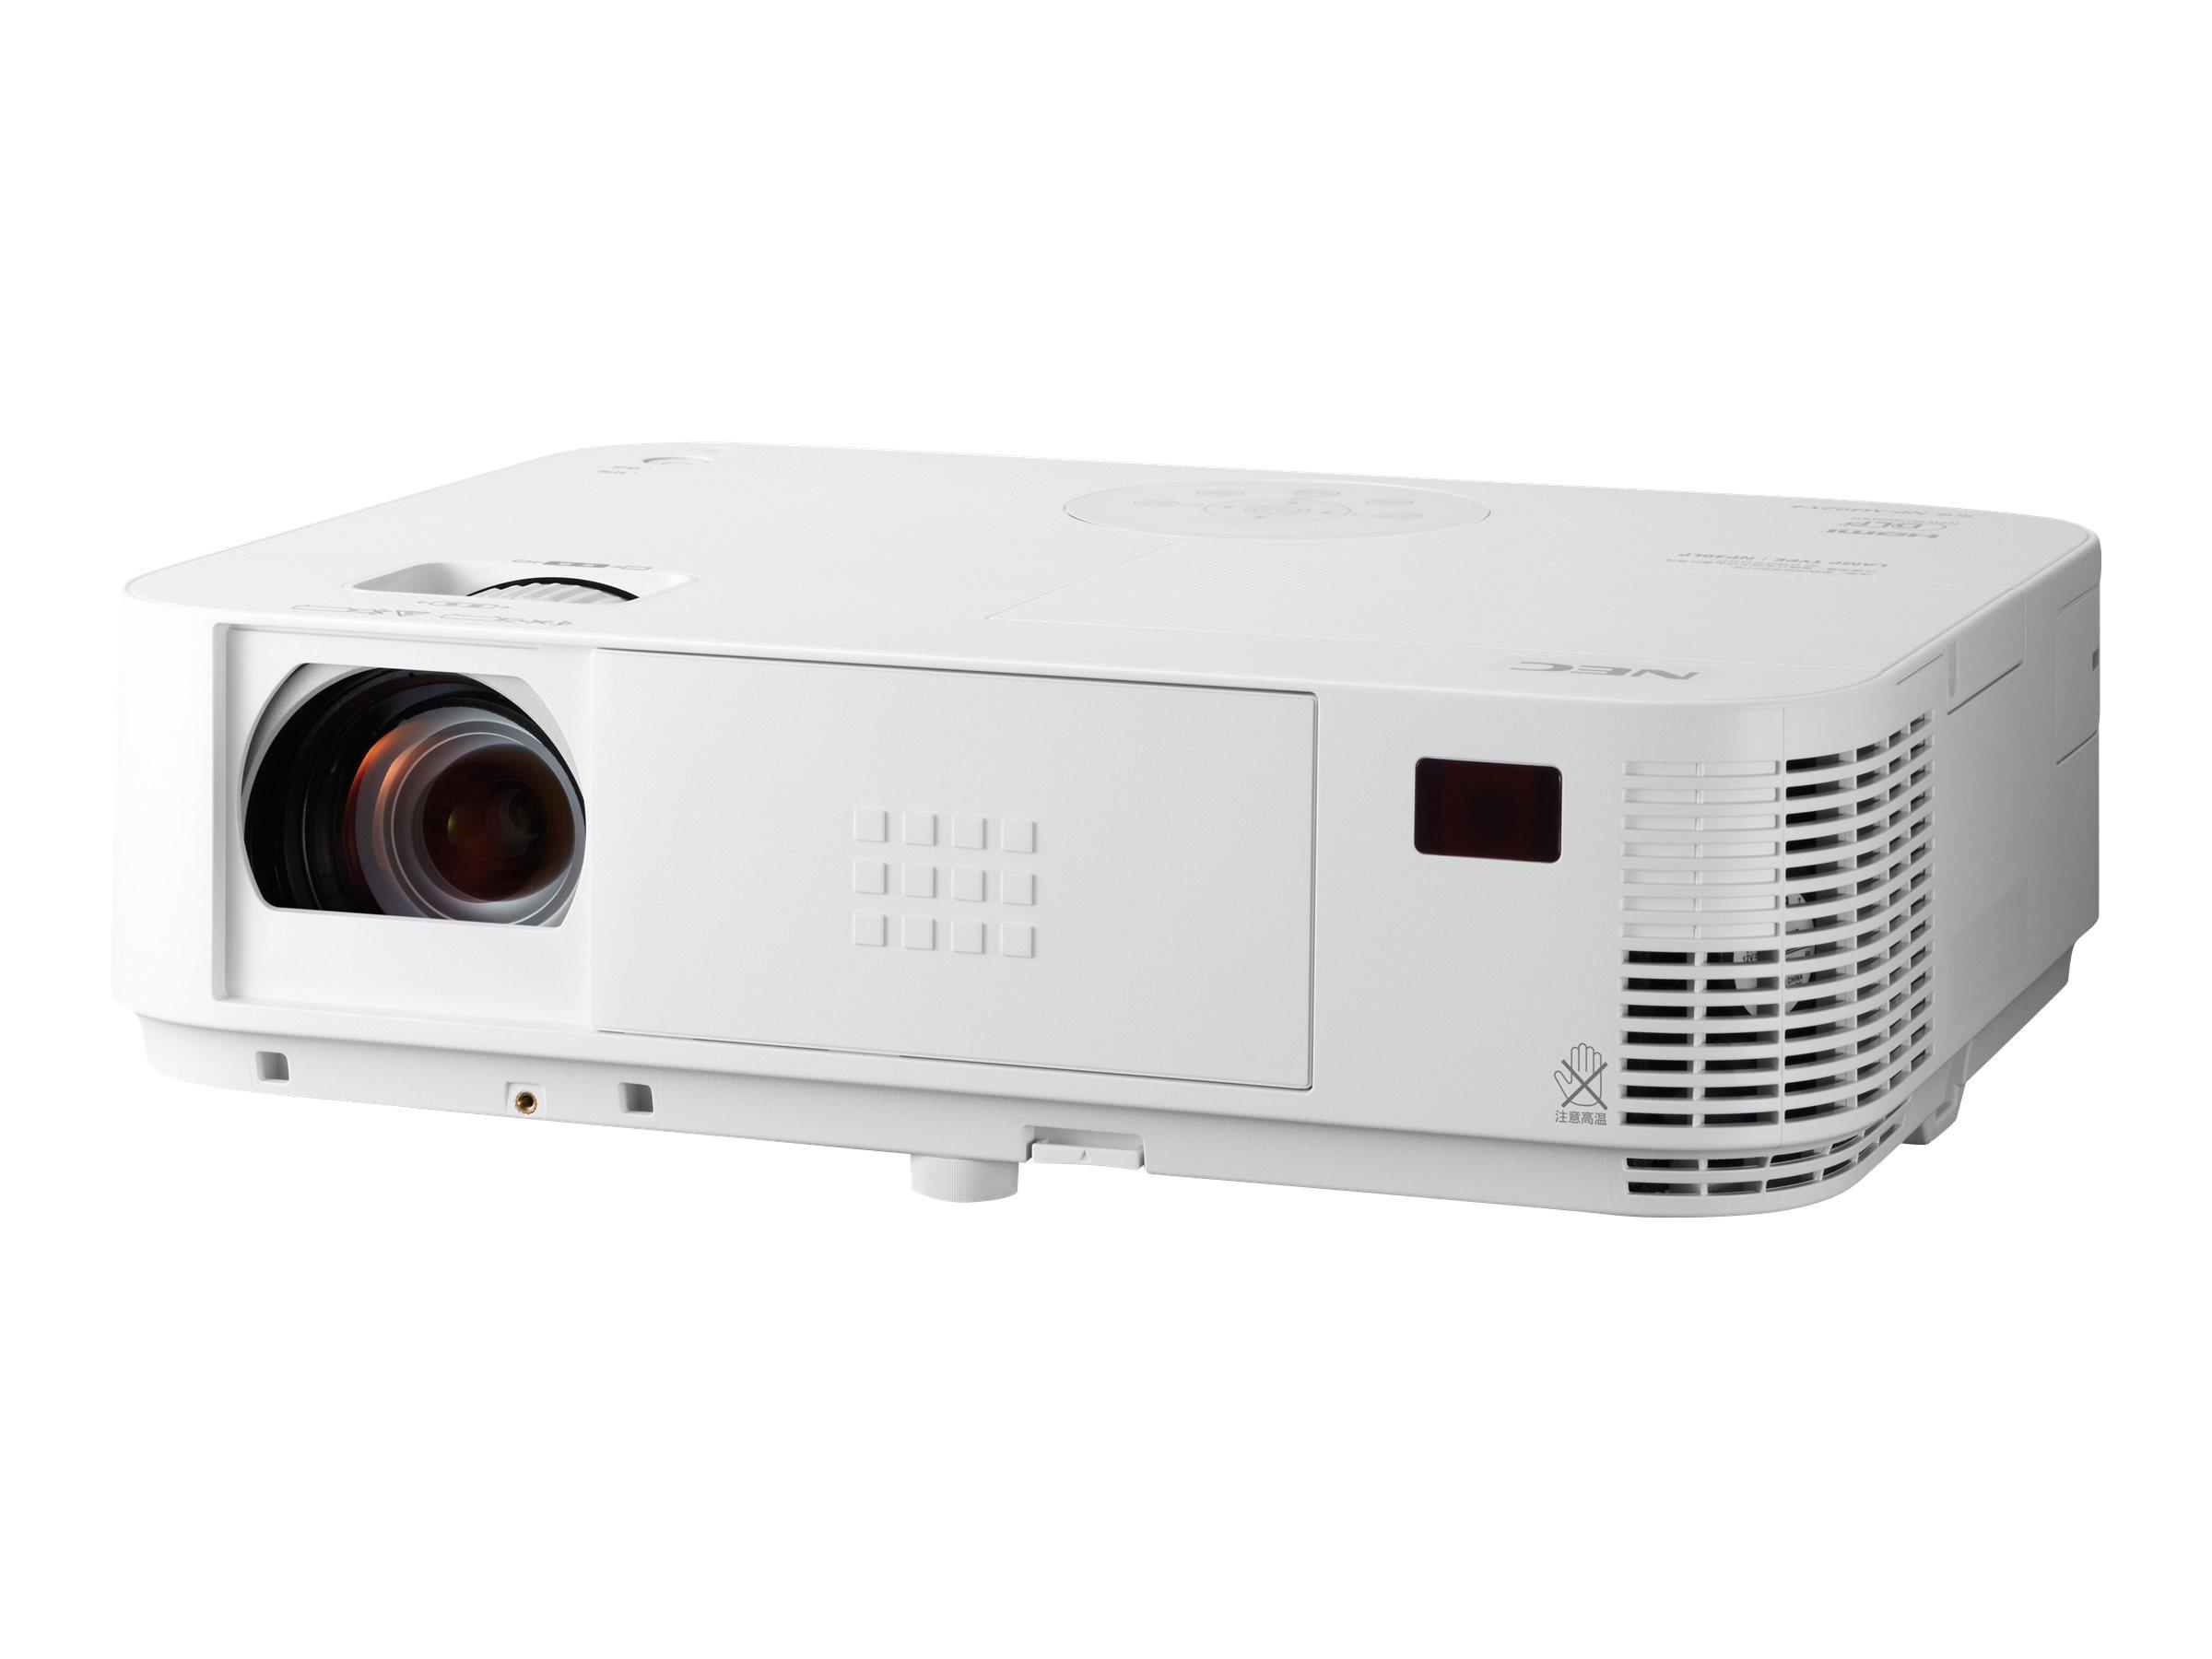 NEC M403H PROYECTOR DLP 3D 4000 ANSI LUMENS 1920 X